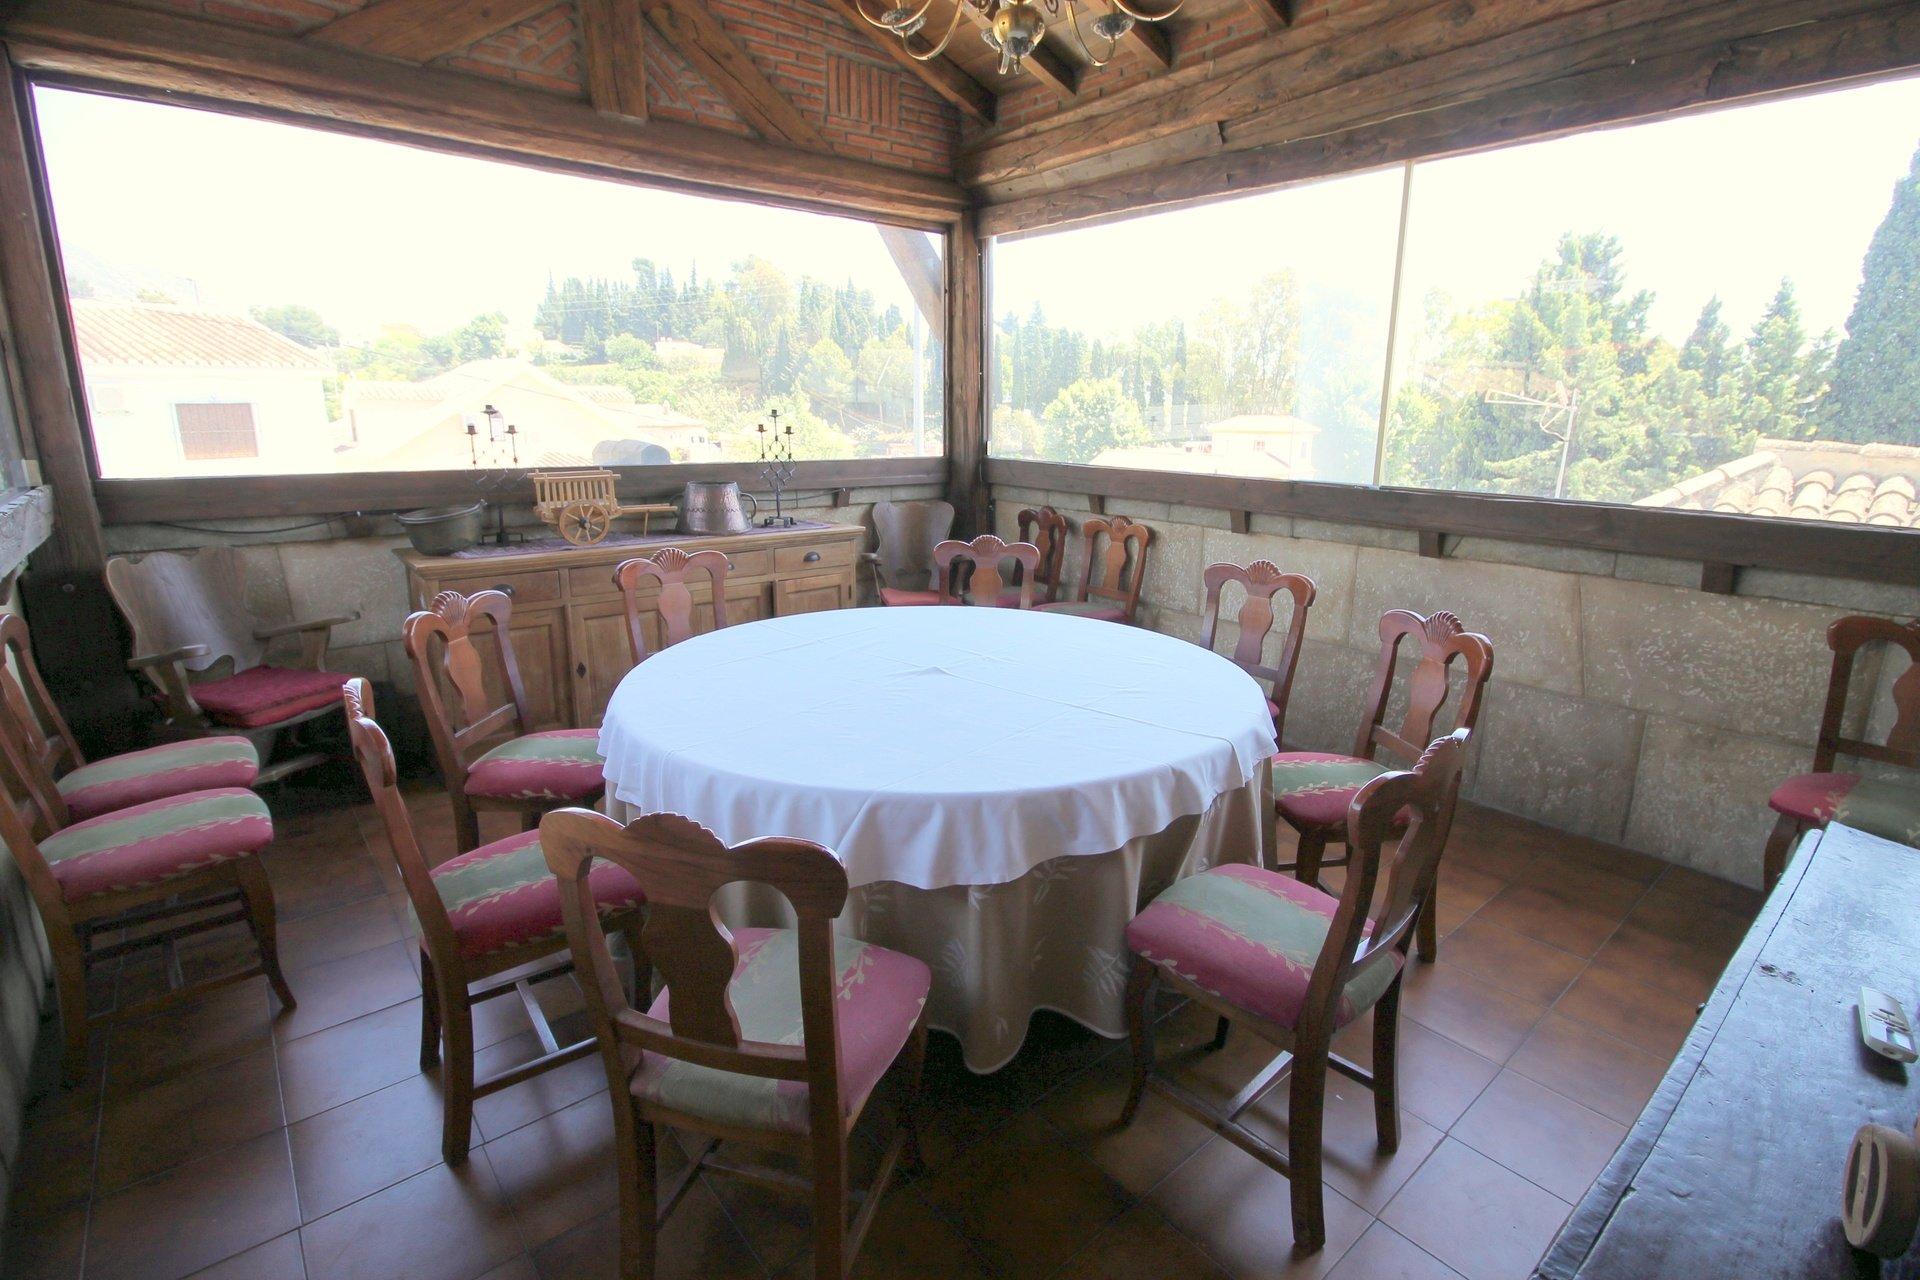 Malaga corporate event venues Restaurant Casa Navarra - Oficina image 0